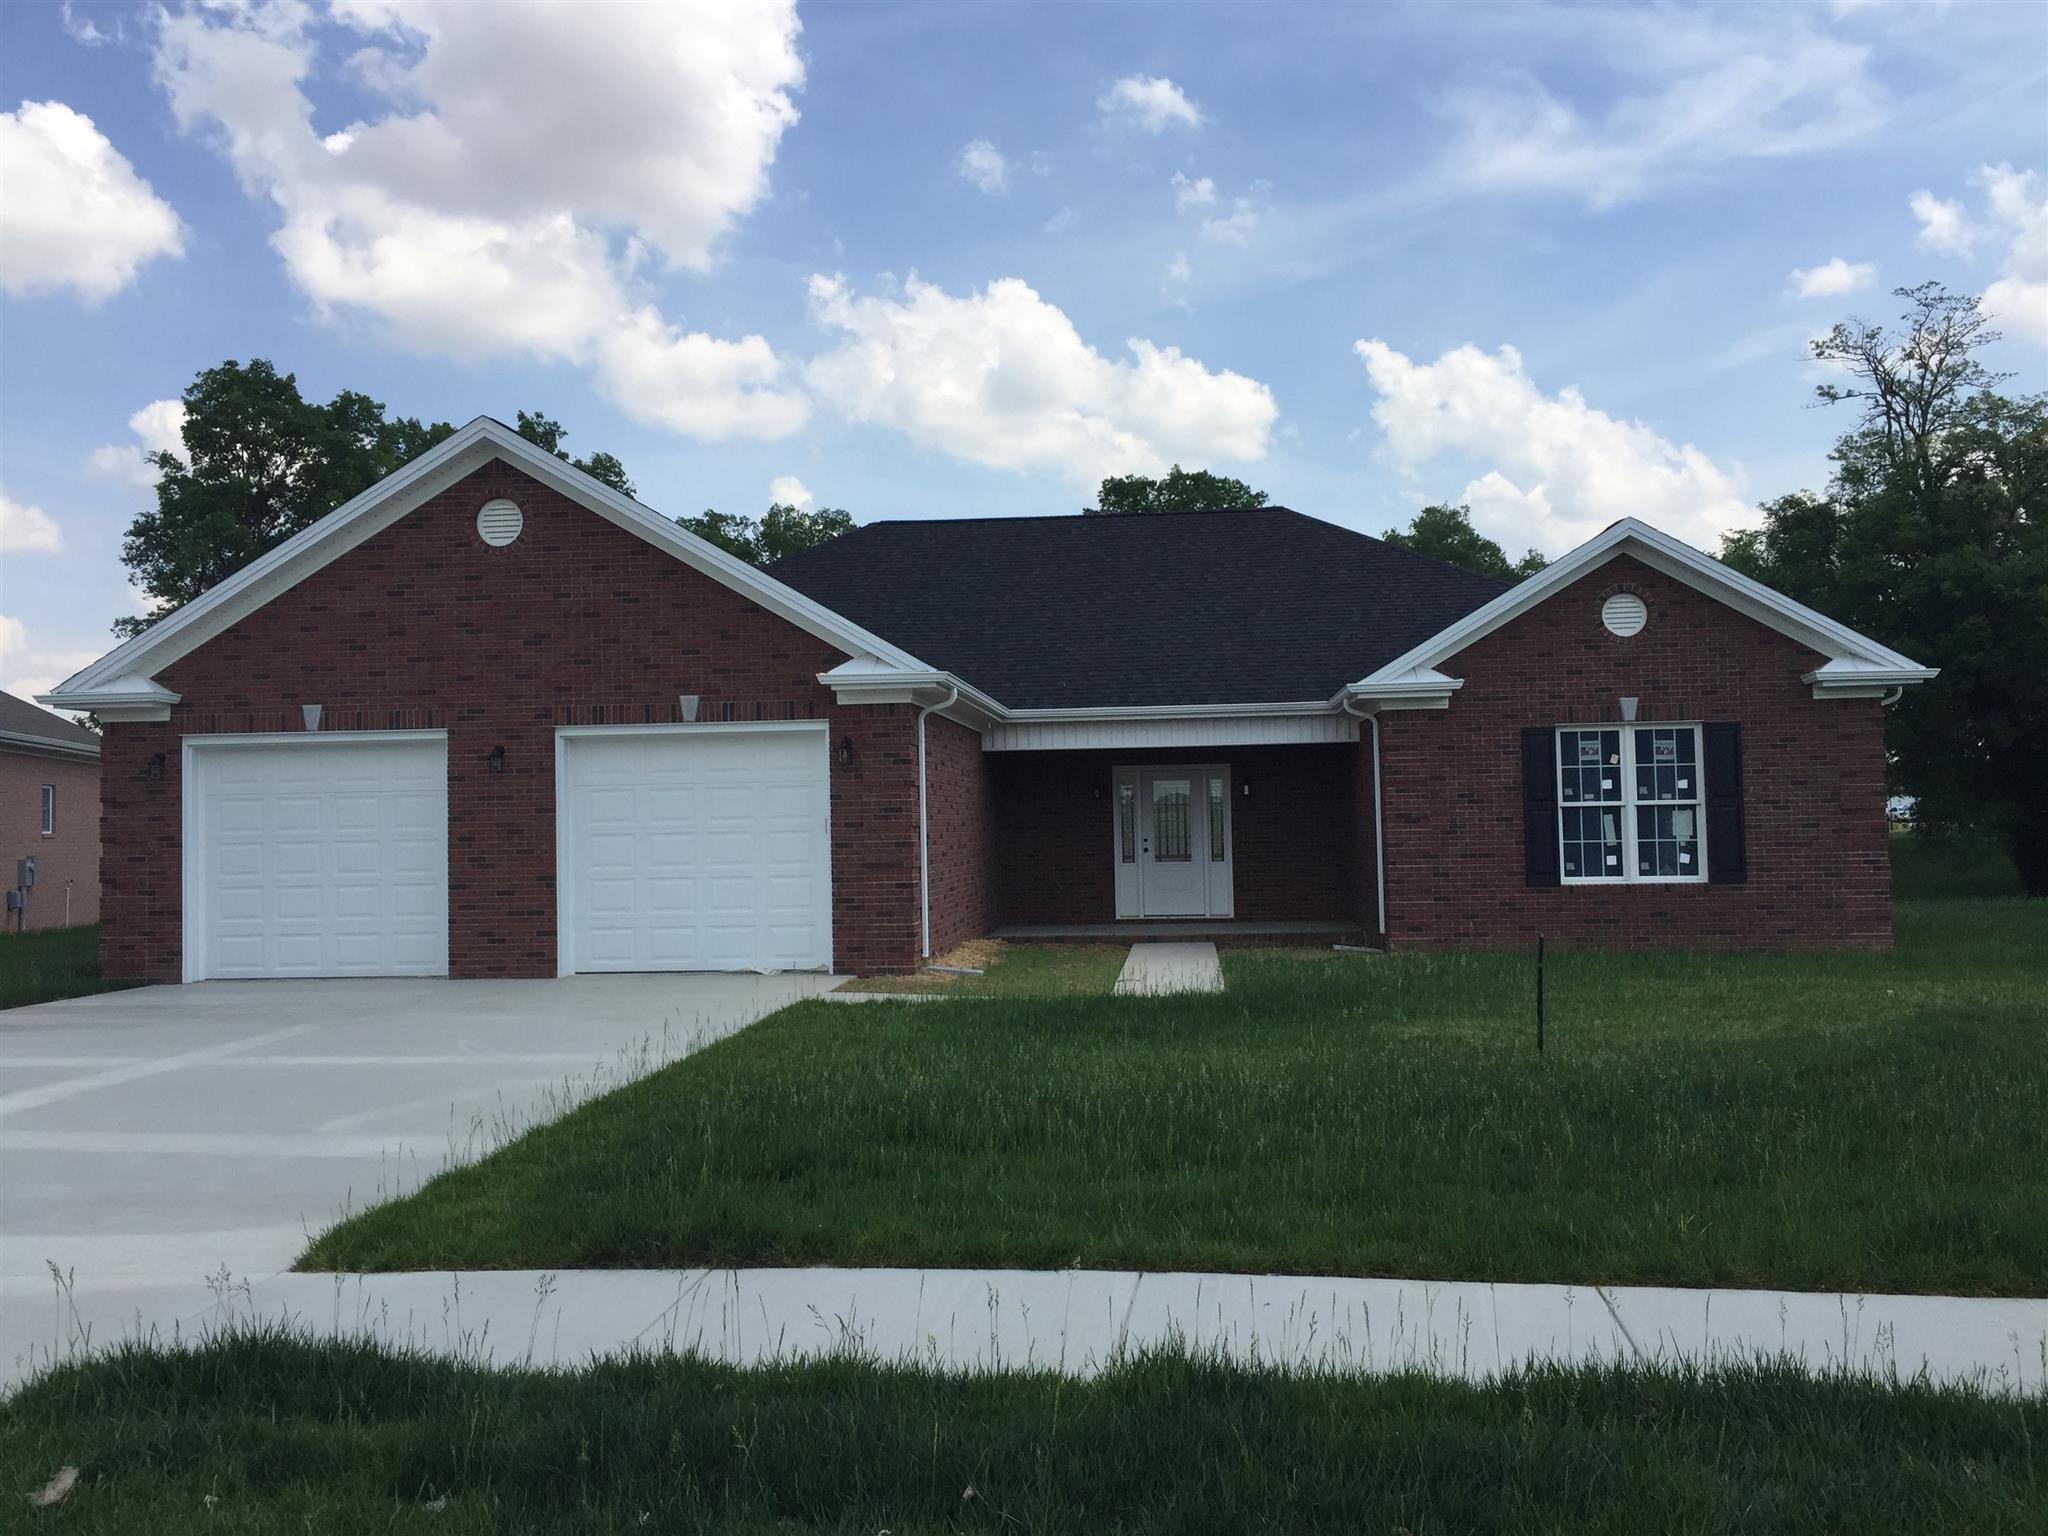 109 Sherinton Place, Hopkinsville, KY 42240 - Hopkinsville, KY real estate listing